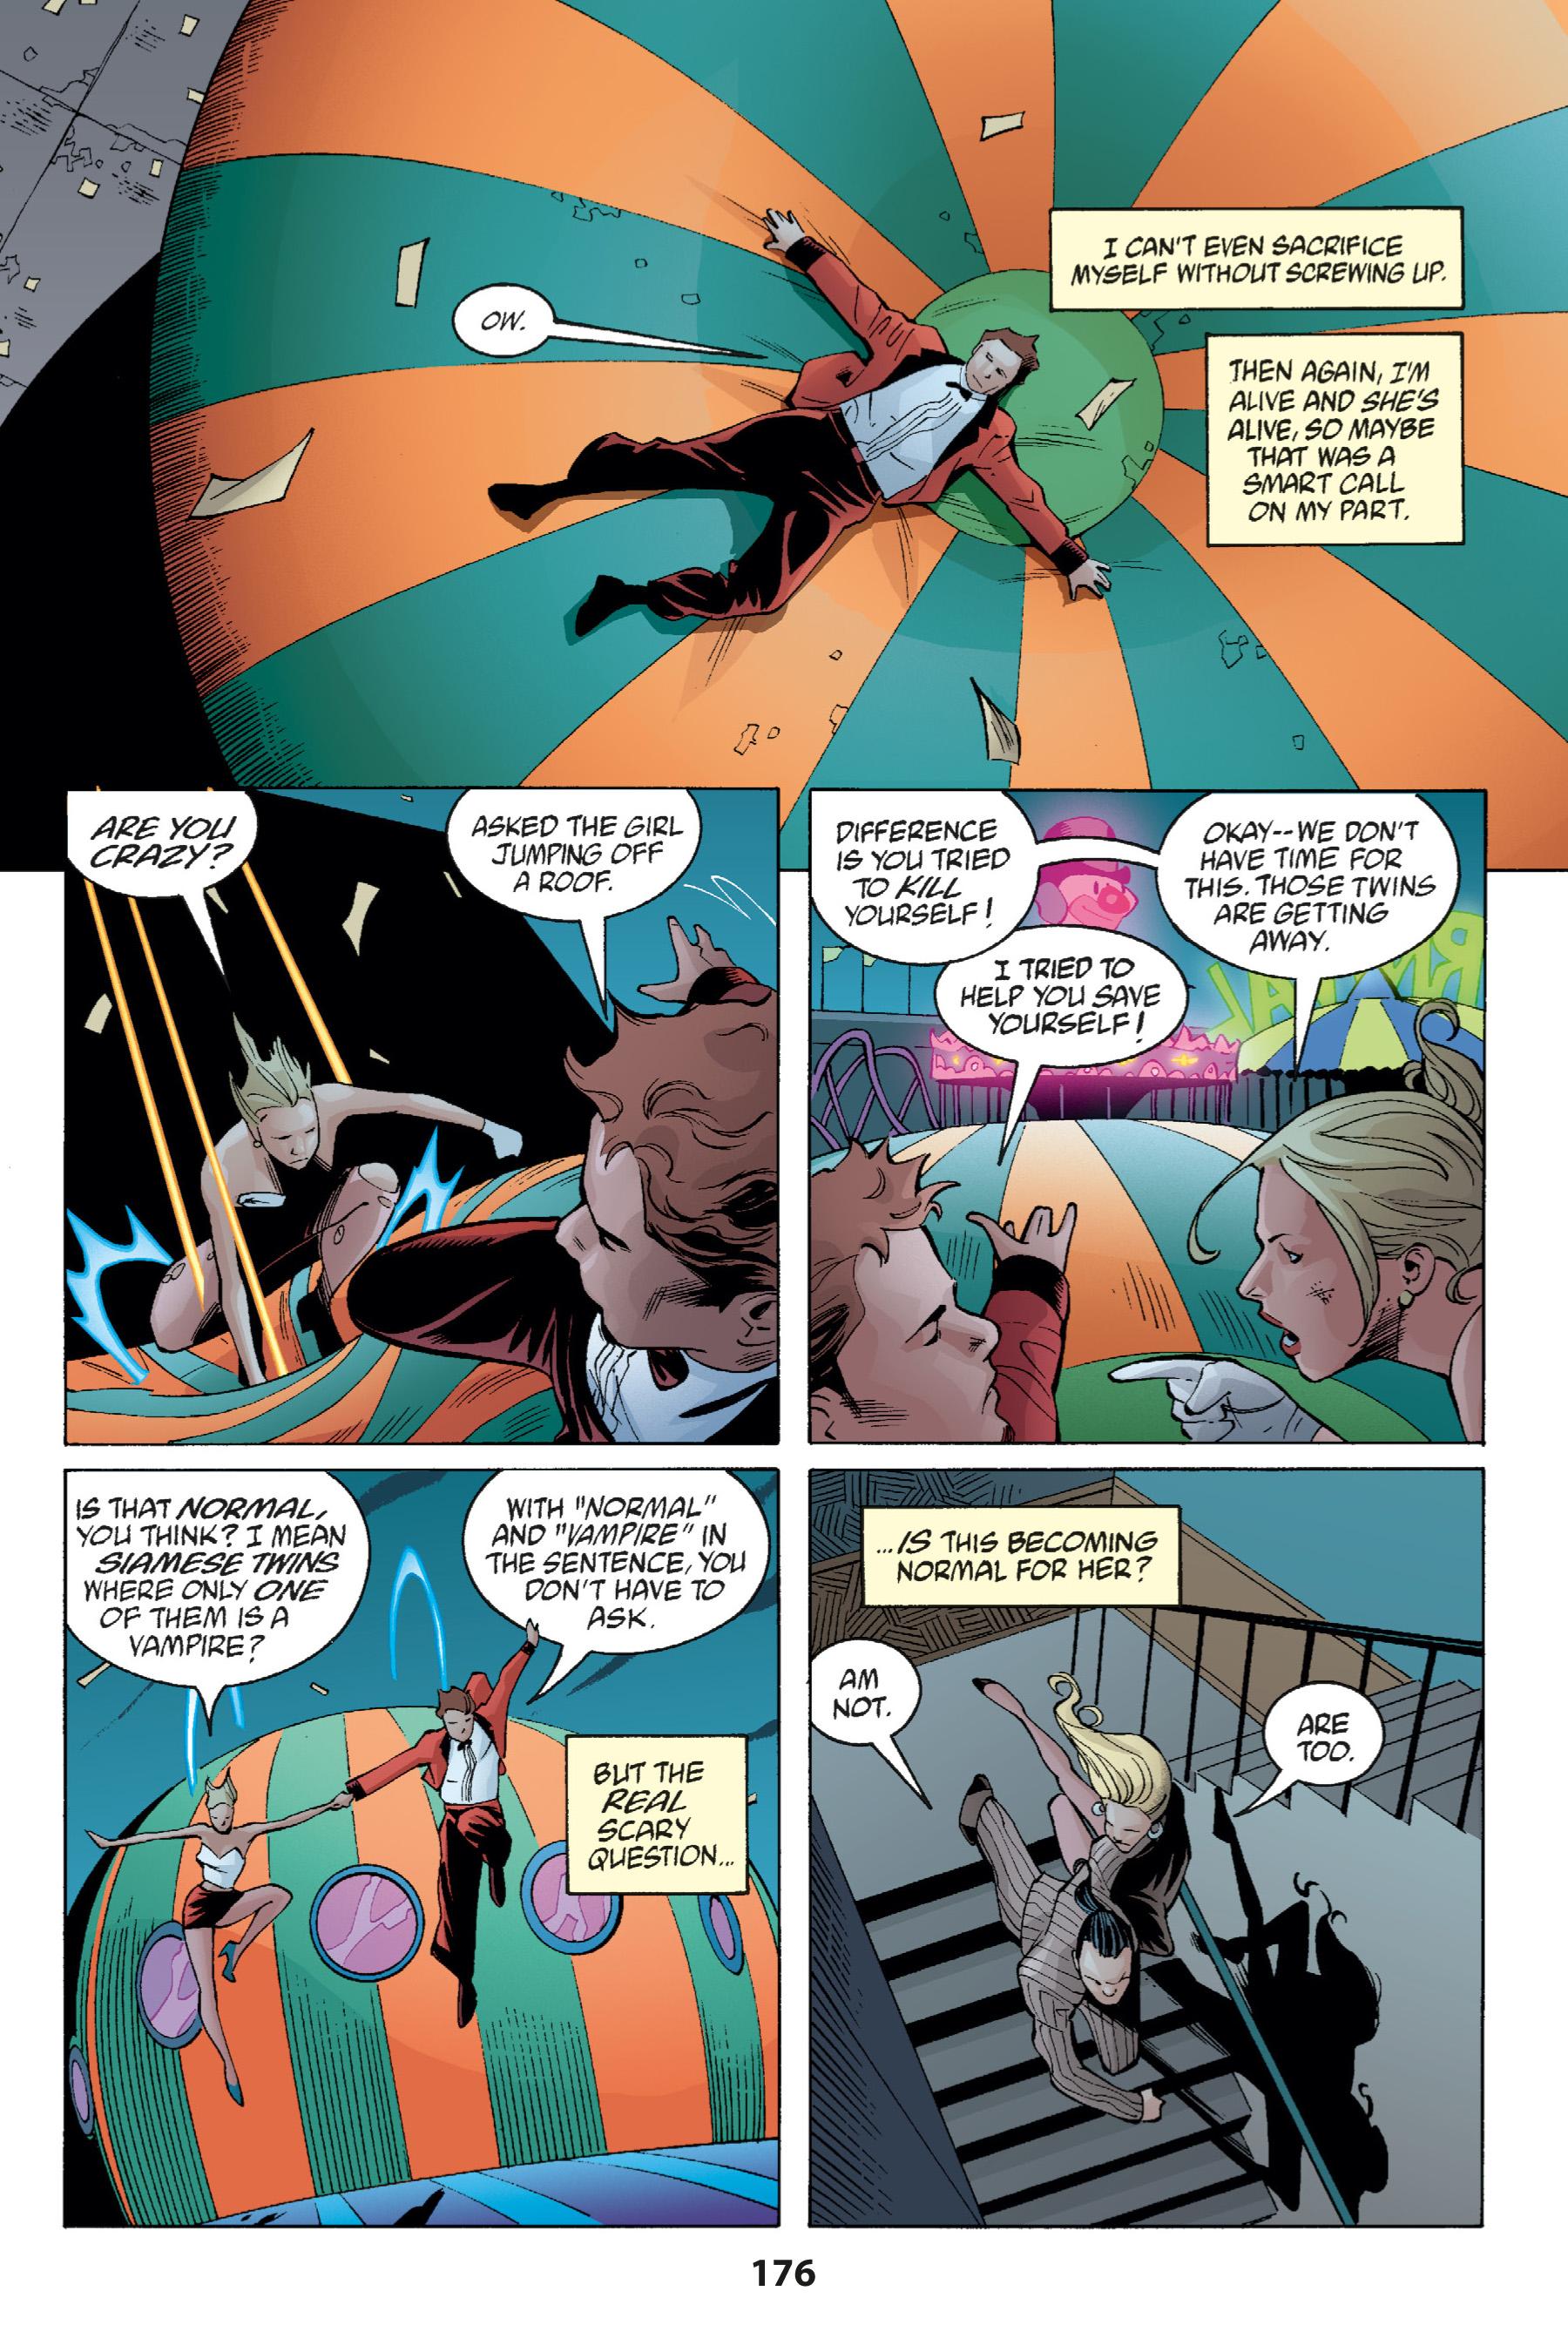 Read online Buffy the Vampire Slayer: Omnibus comic -  Issue # TPB 1 - 174